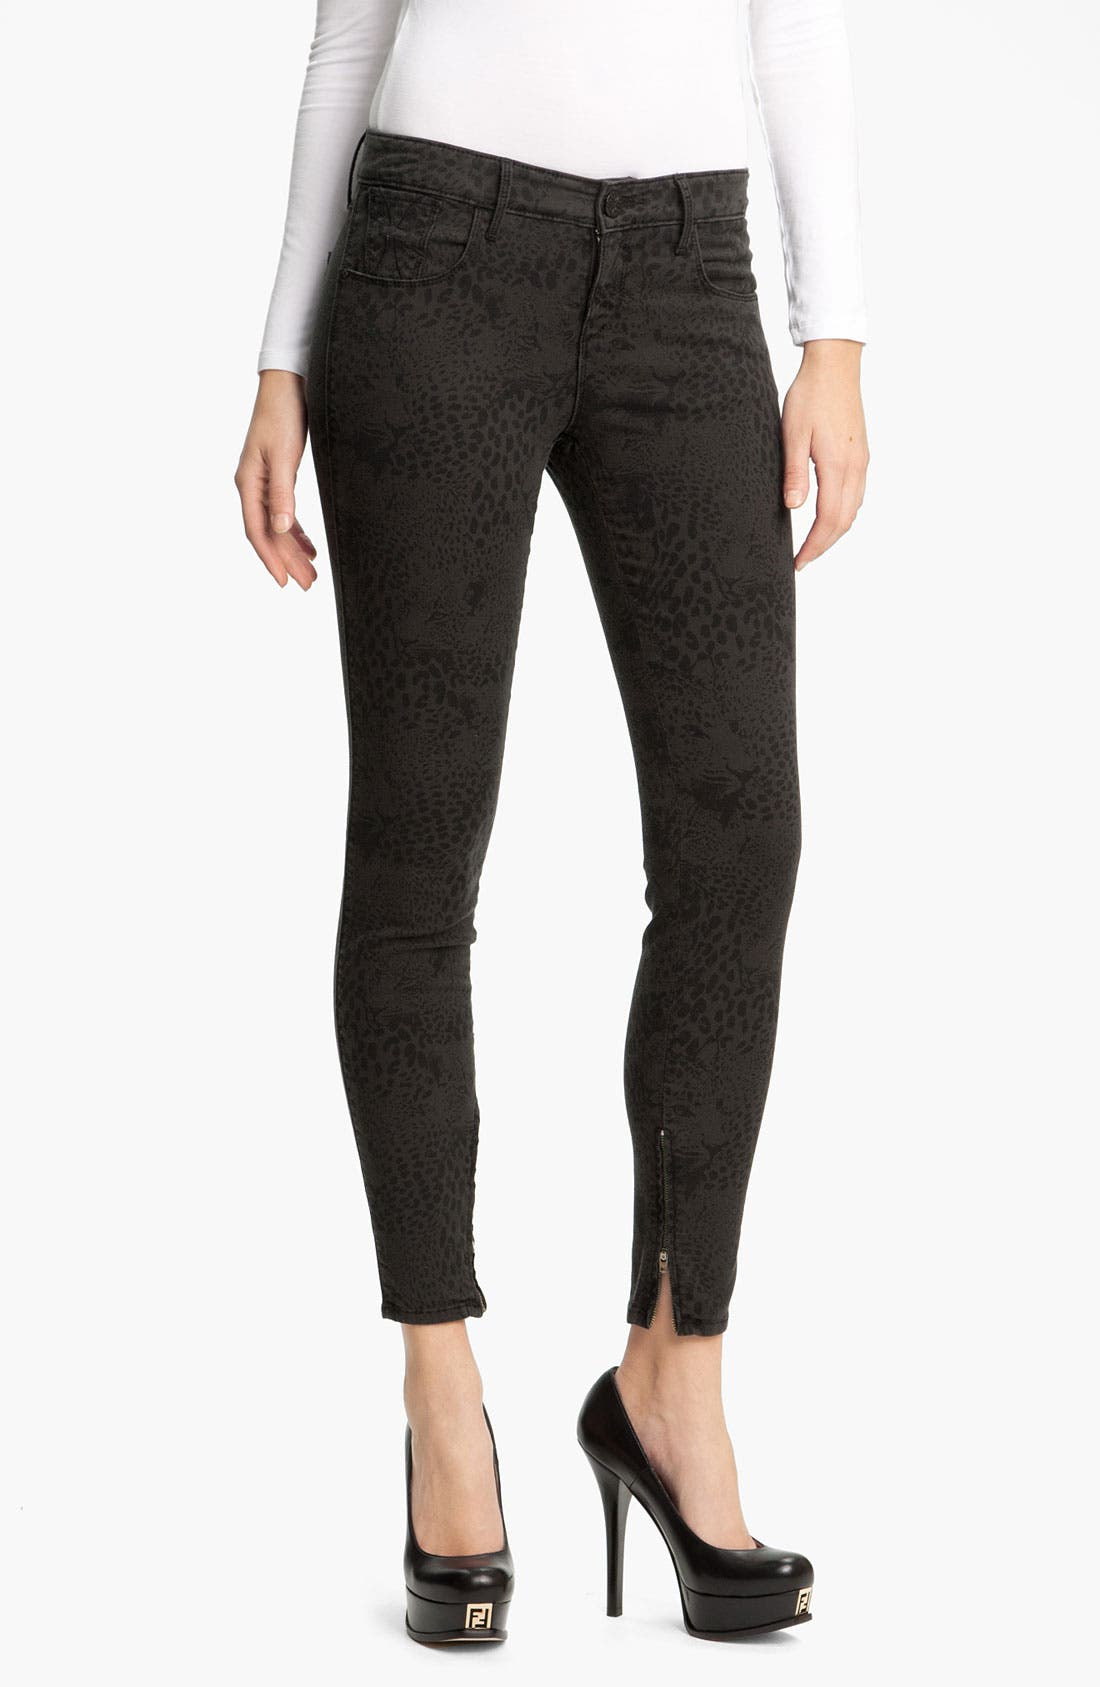 Alternate Image 1 Selected - Habitual 'Almas' Leopard Print Skinny Stretch Jeans